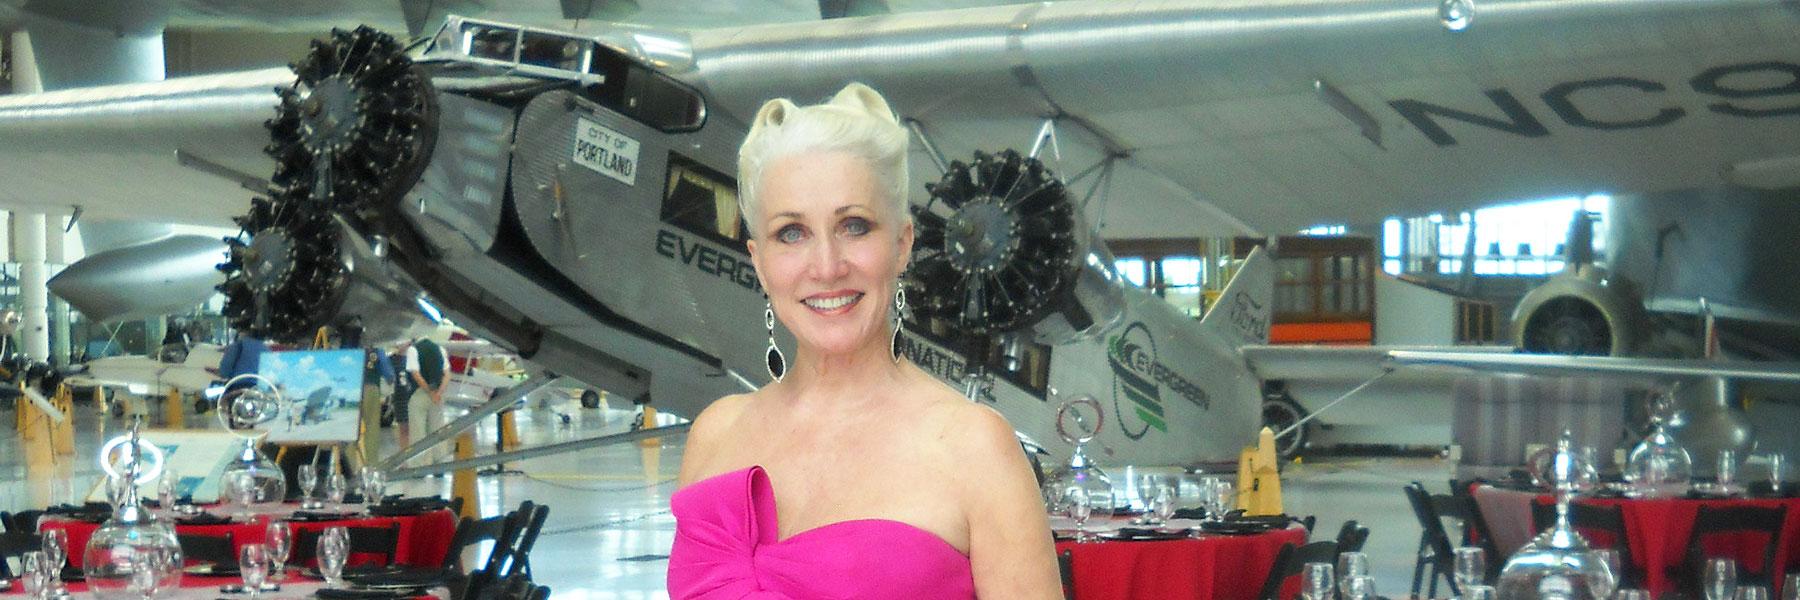 Linda Lee Michelet, glamour songstress